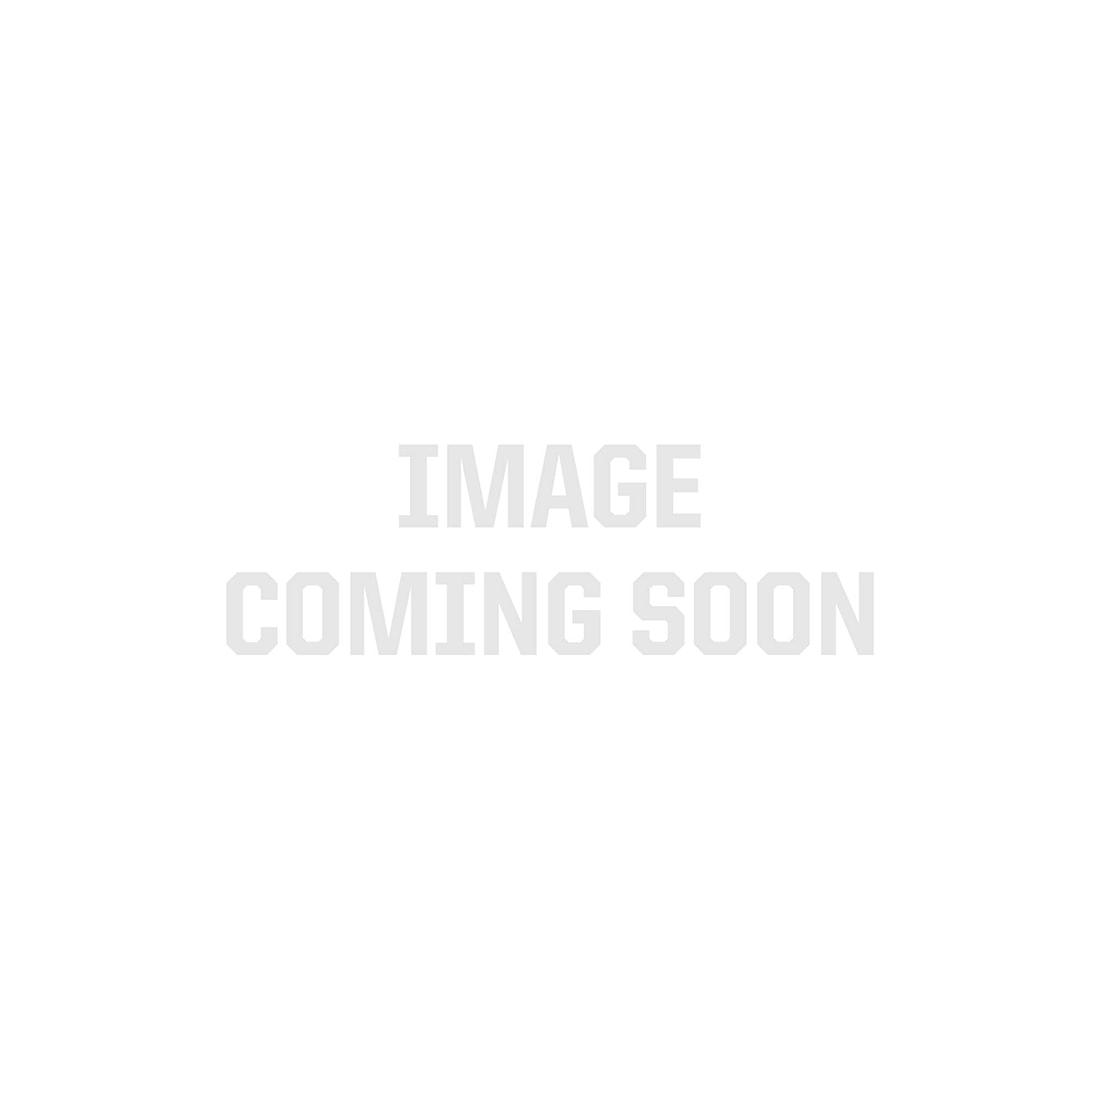 Espen Ultron VEV6012MVHDA-10V-24 60W 12V Output Dimmable LED Driver (0-10V)